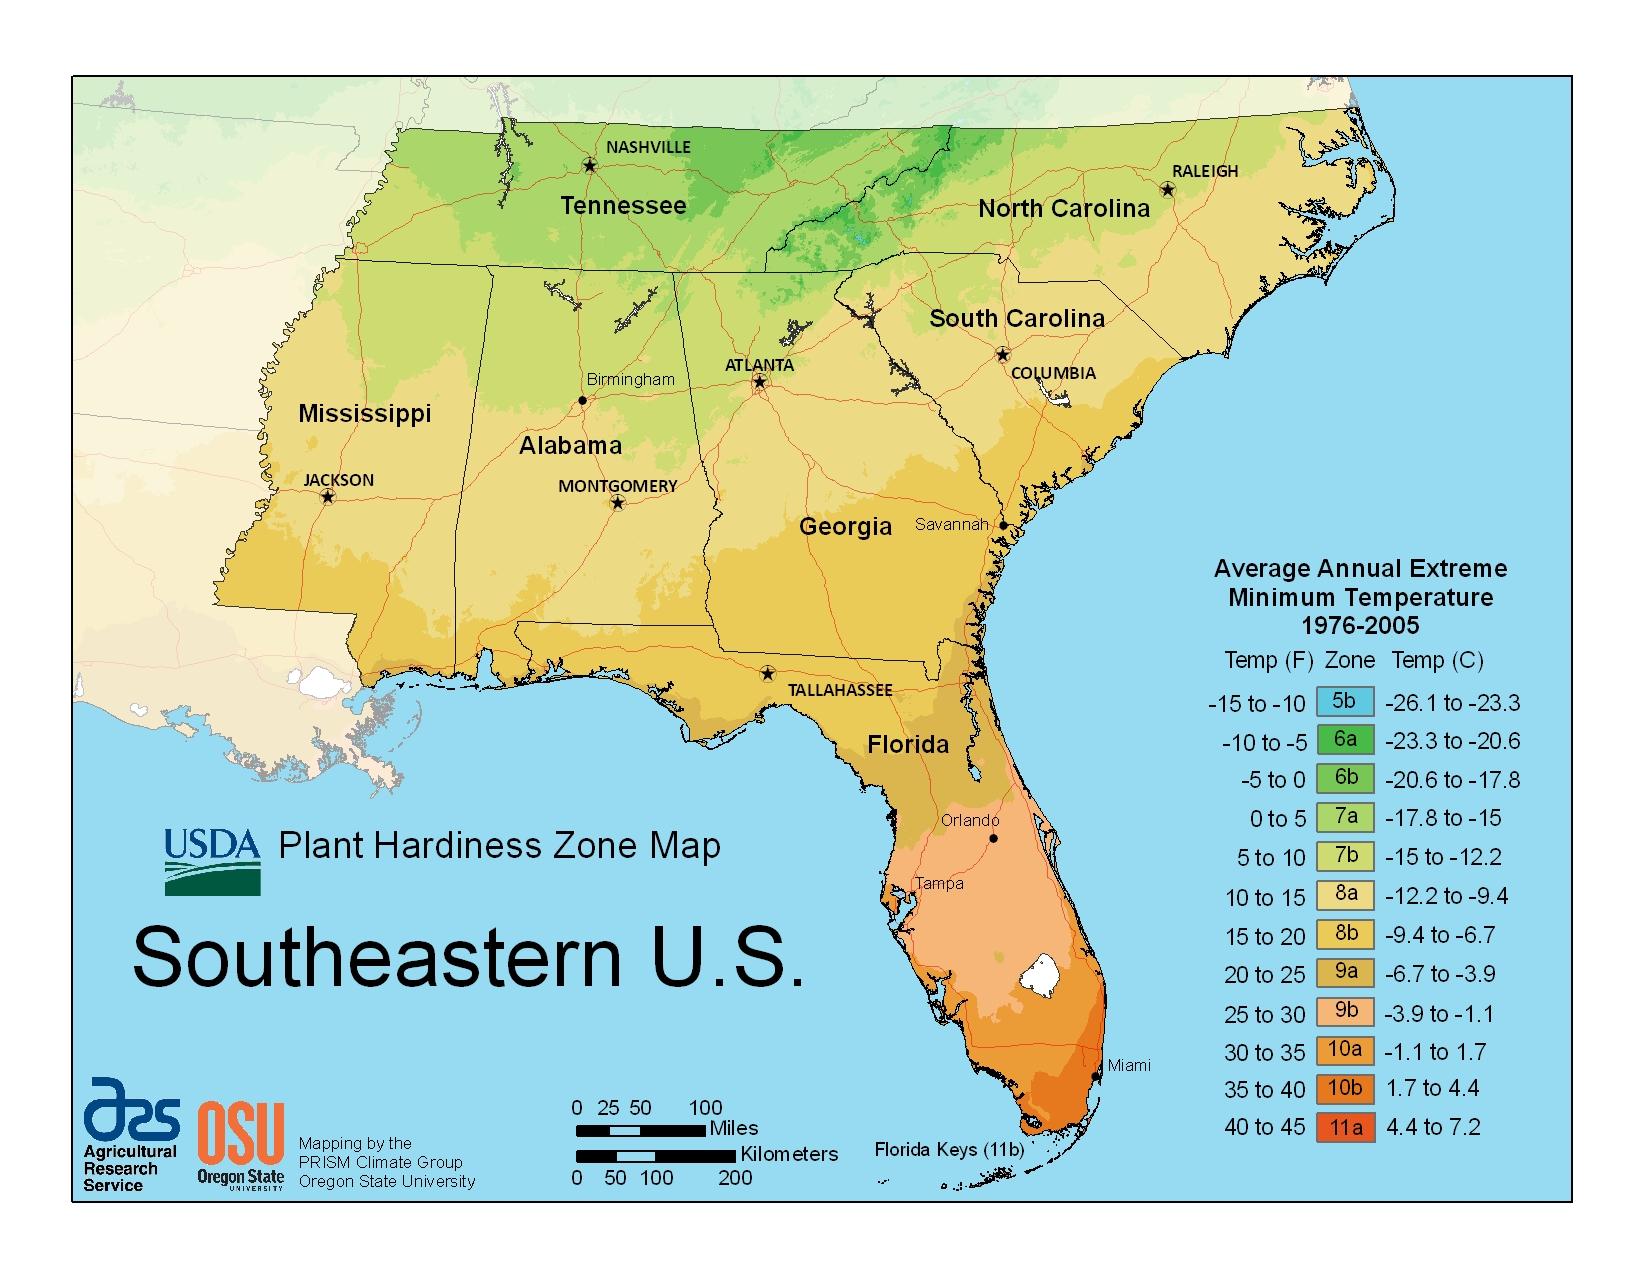 USDA Hardiness Zone Finder Gardenorg Map Downloads USDA Plant - Us map south region